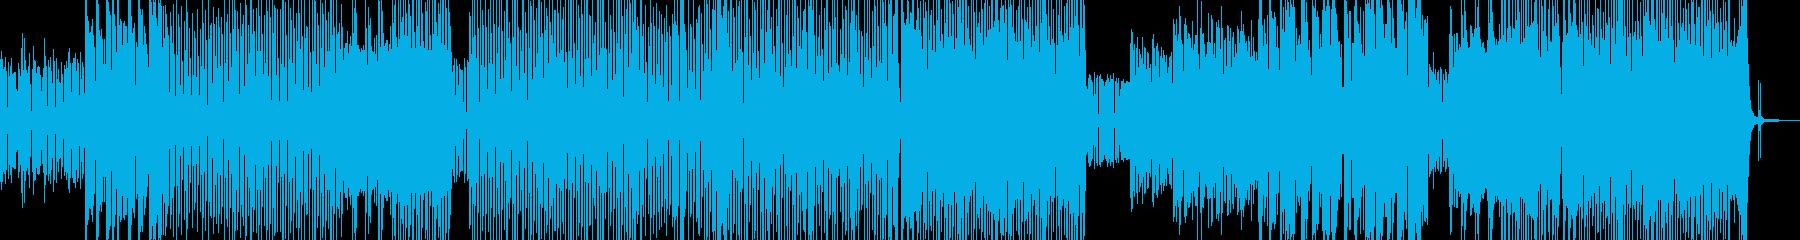 ○oお菓子の国・パステル調ポップo○ Bの再生済みの波形